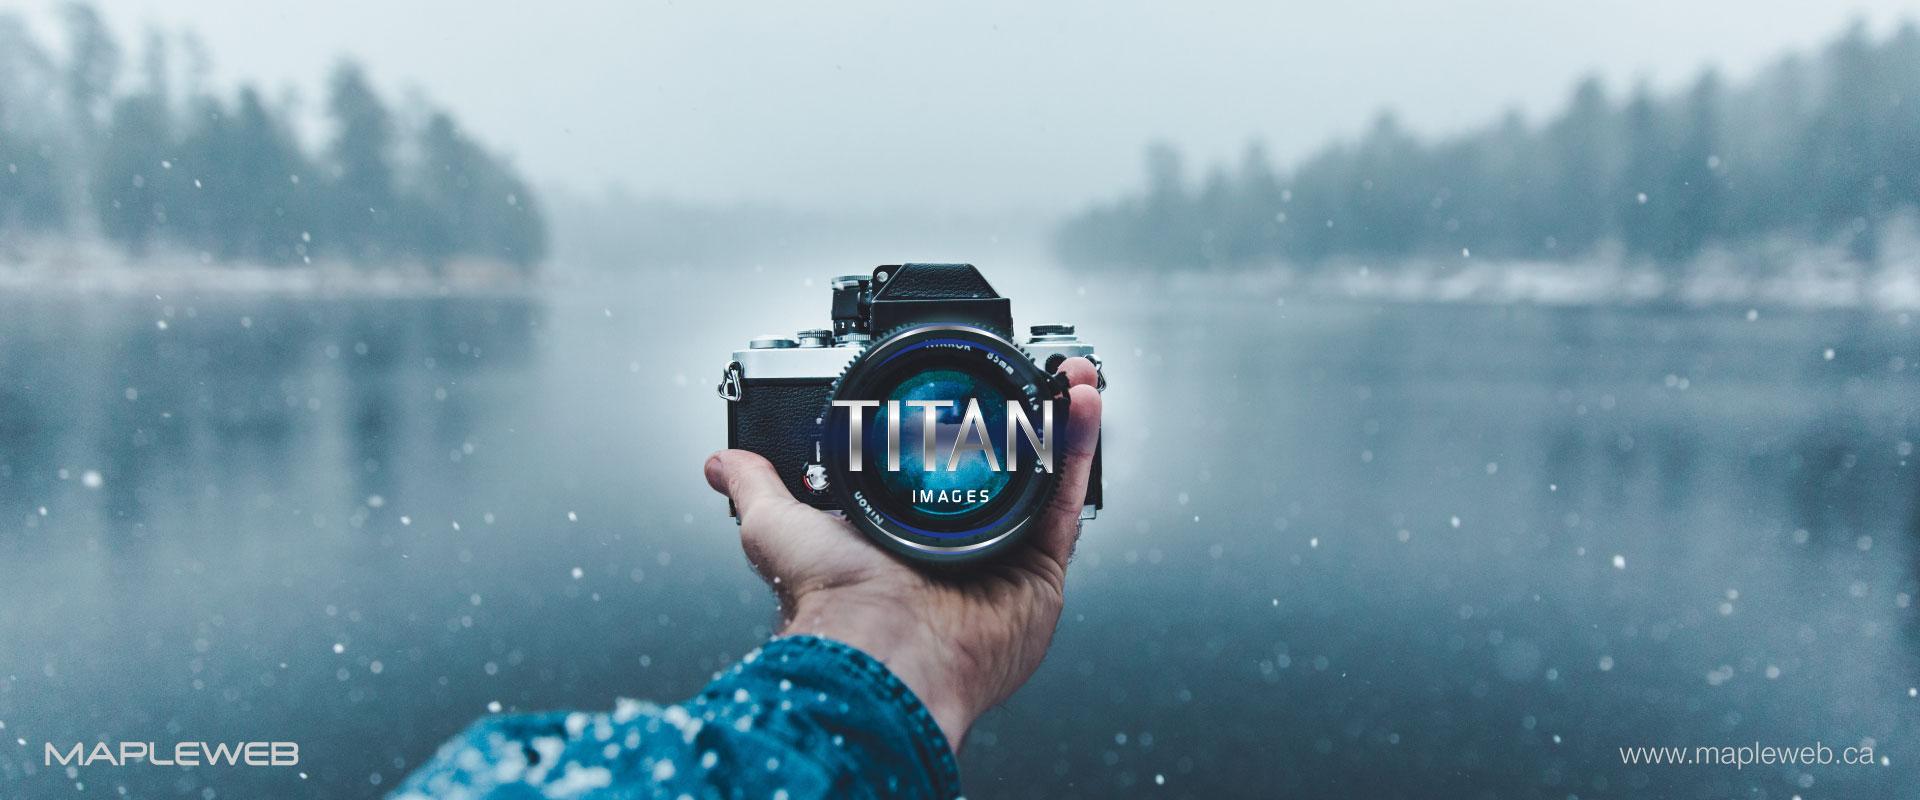 titan-brand-logo-design-by-mapleweb-vancouver-canada-camera-in-hand-mock